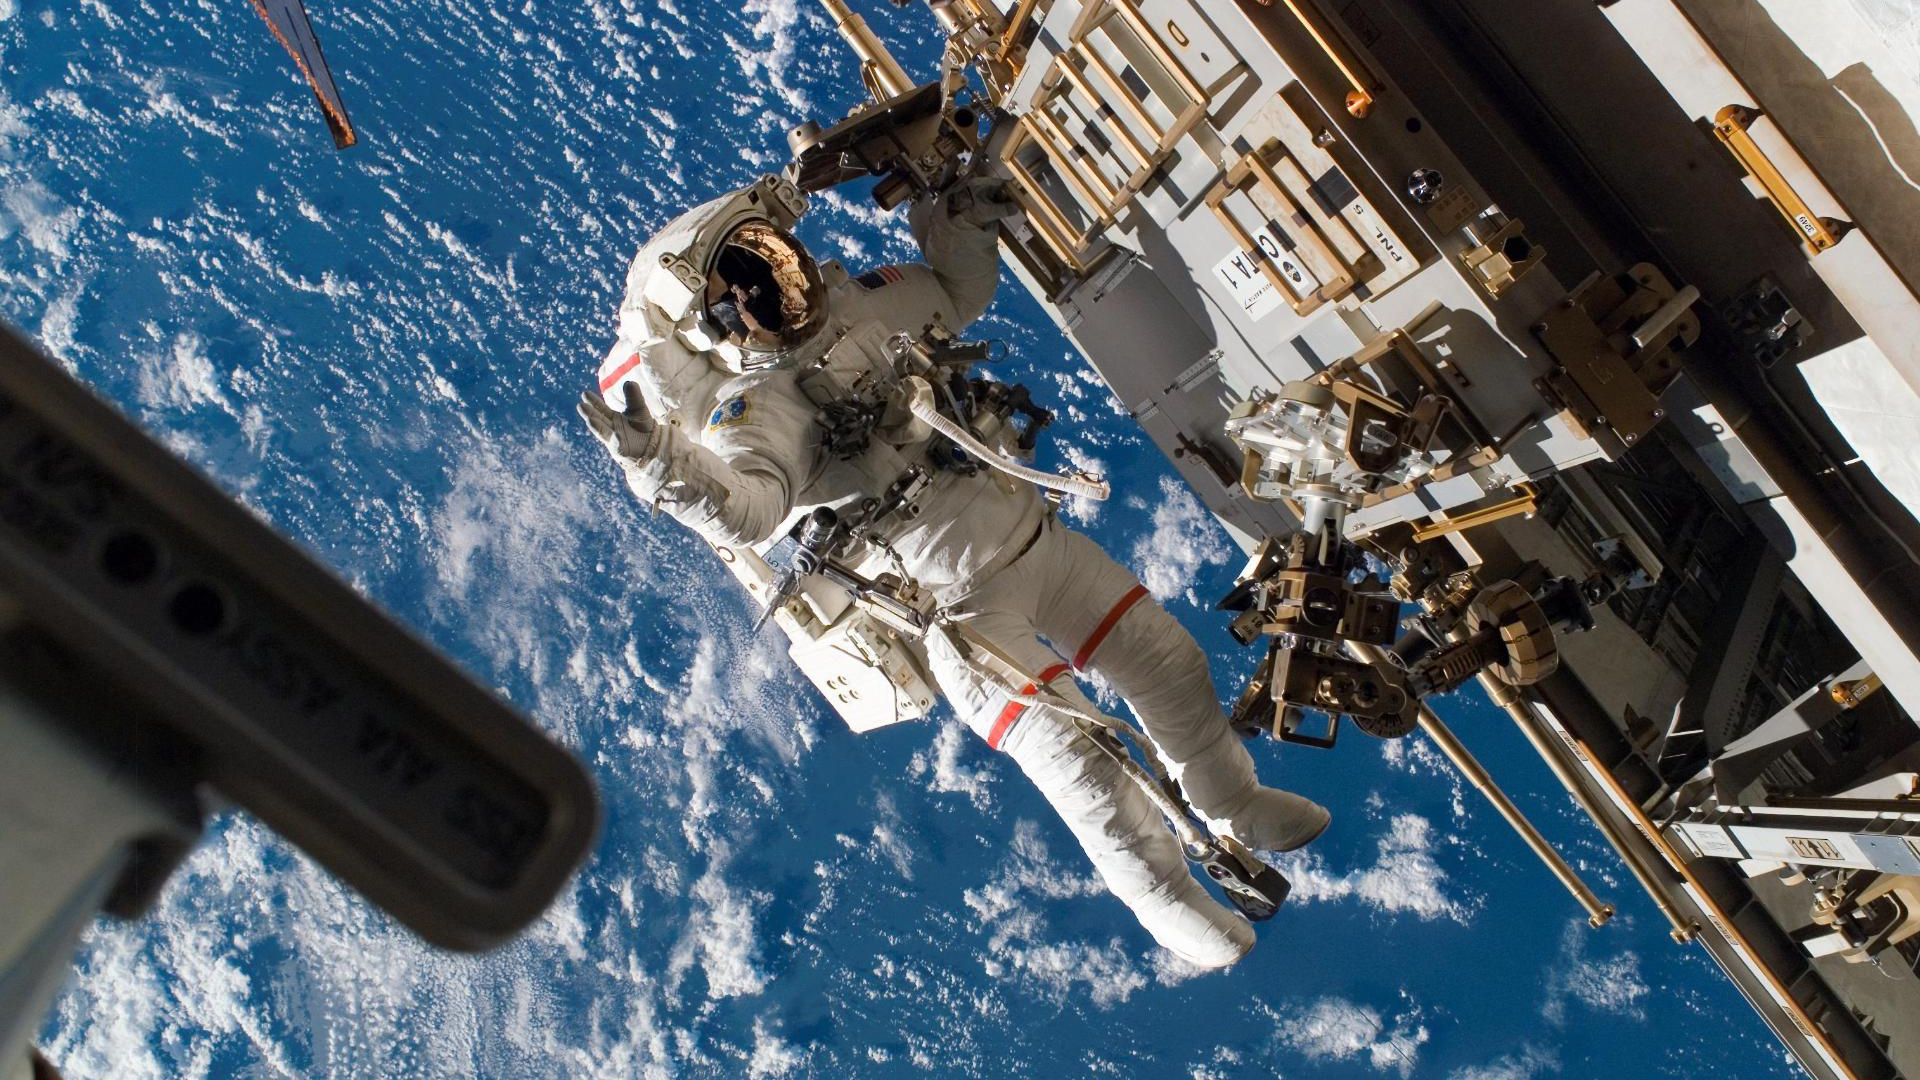 Astronaut In Space HD Wallpaper 1920x1080 ID18305 1920x1080